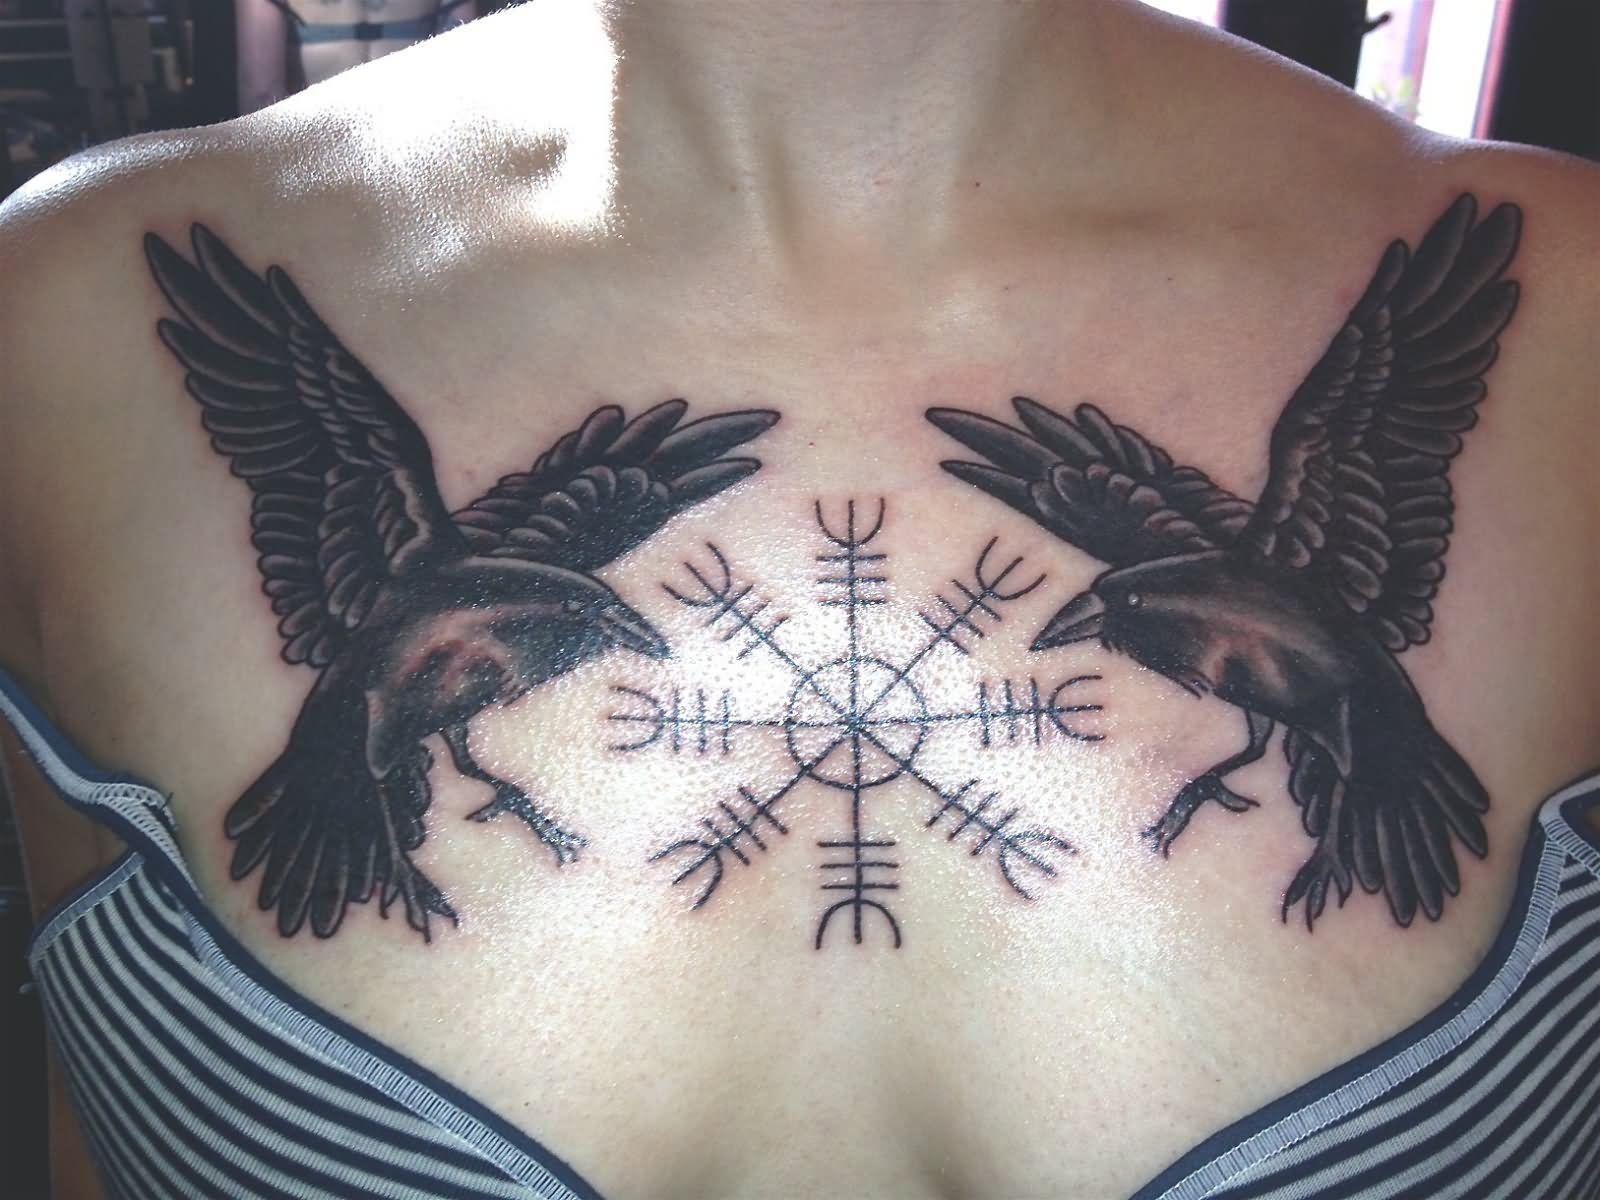 Tattoo design 18